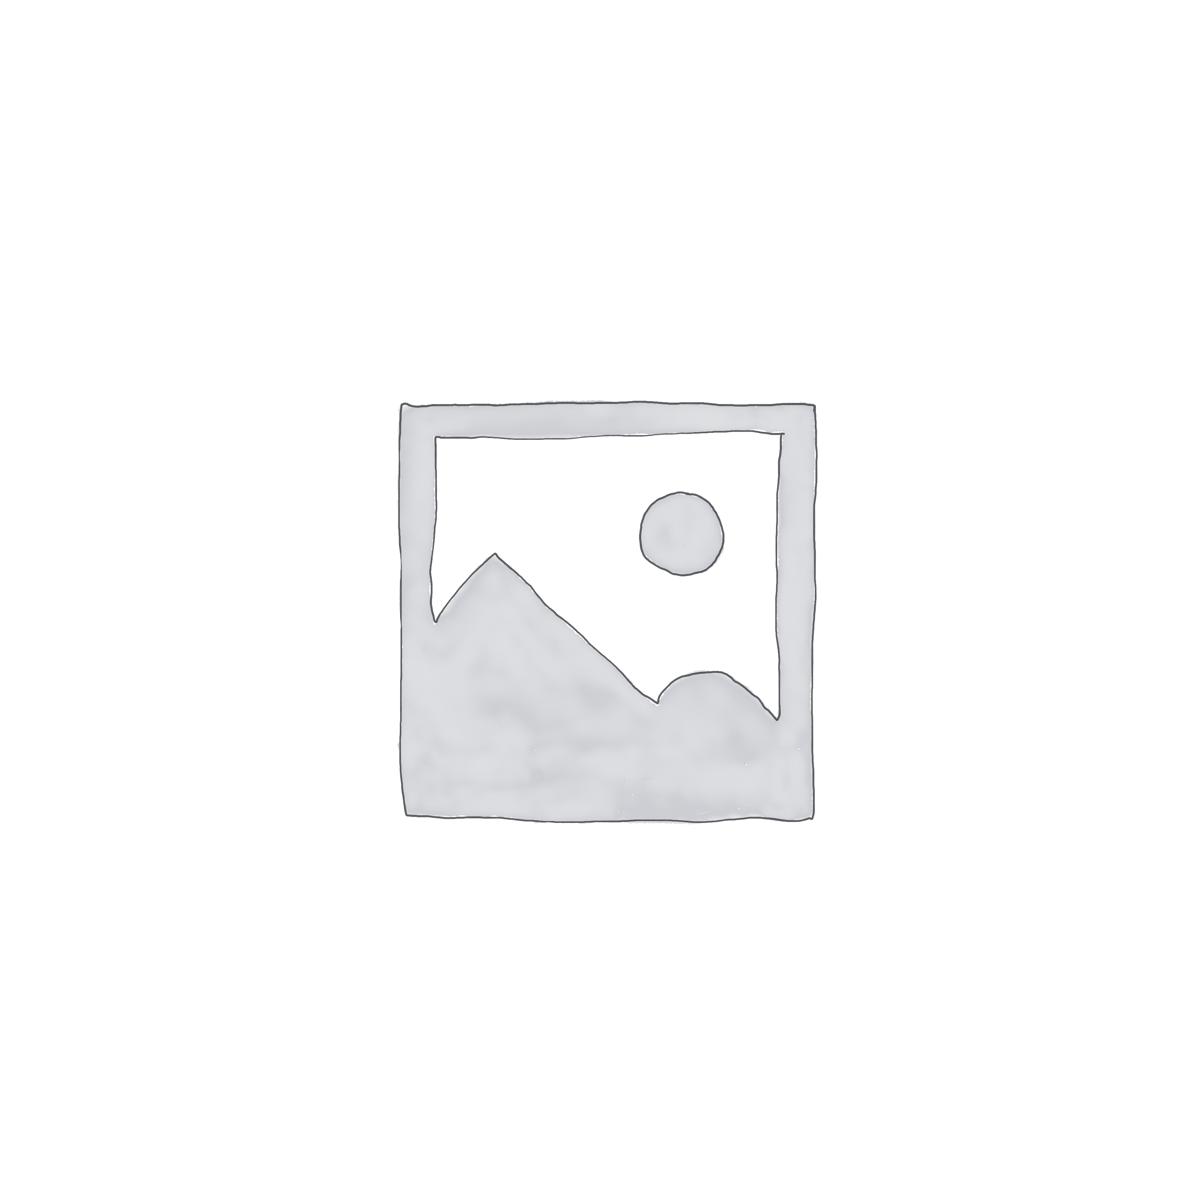 Vintage Colorful Floral Wallpaper Mural